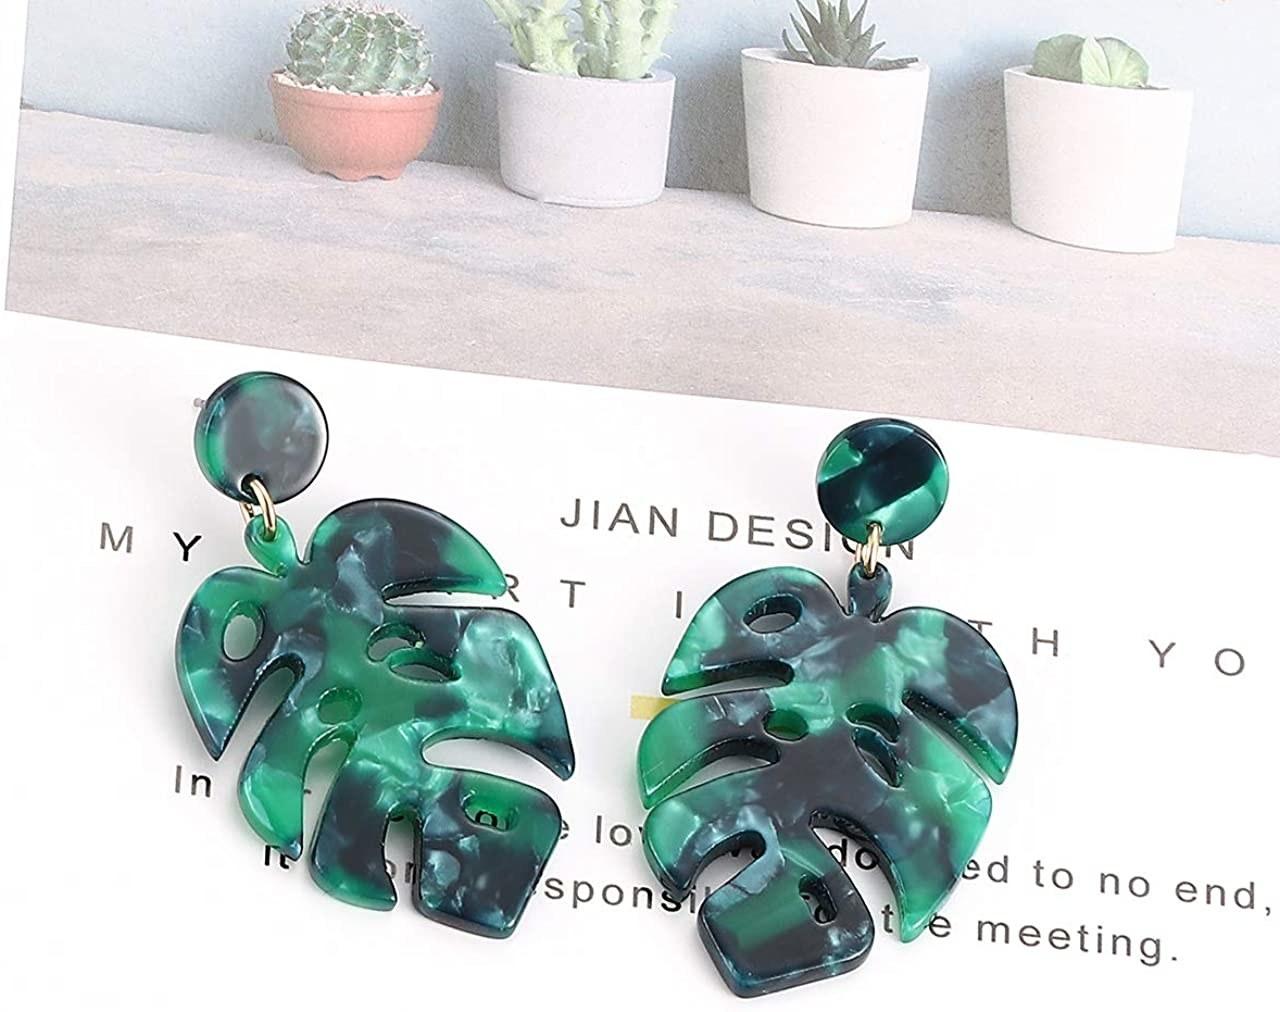 dangling tortoiseshell earrings shaped like leaves